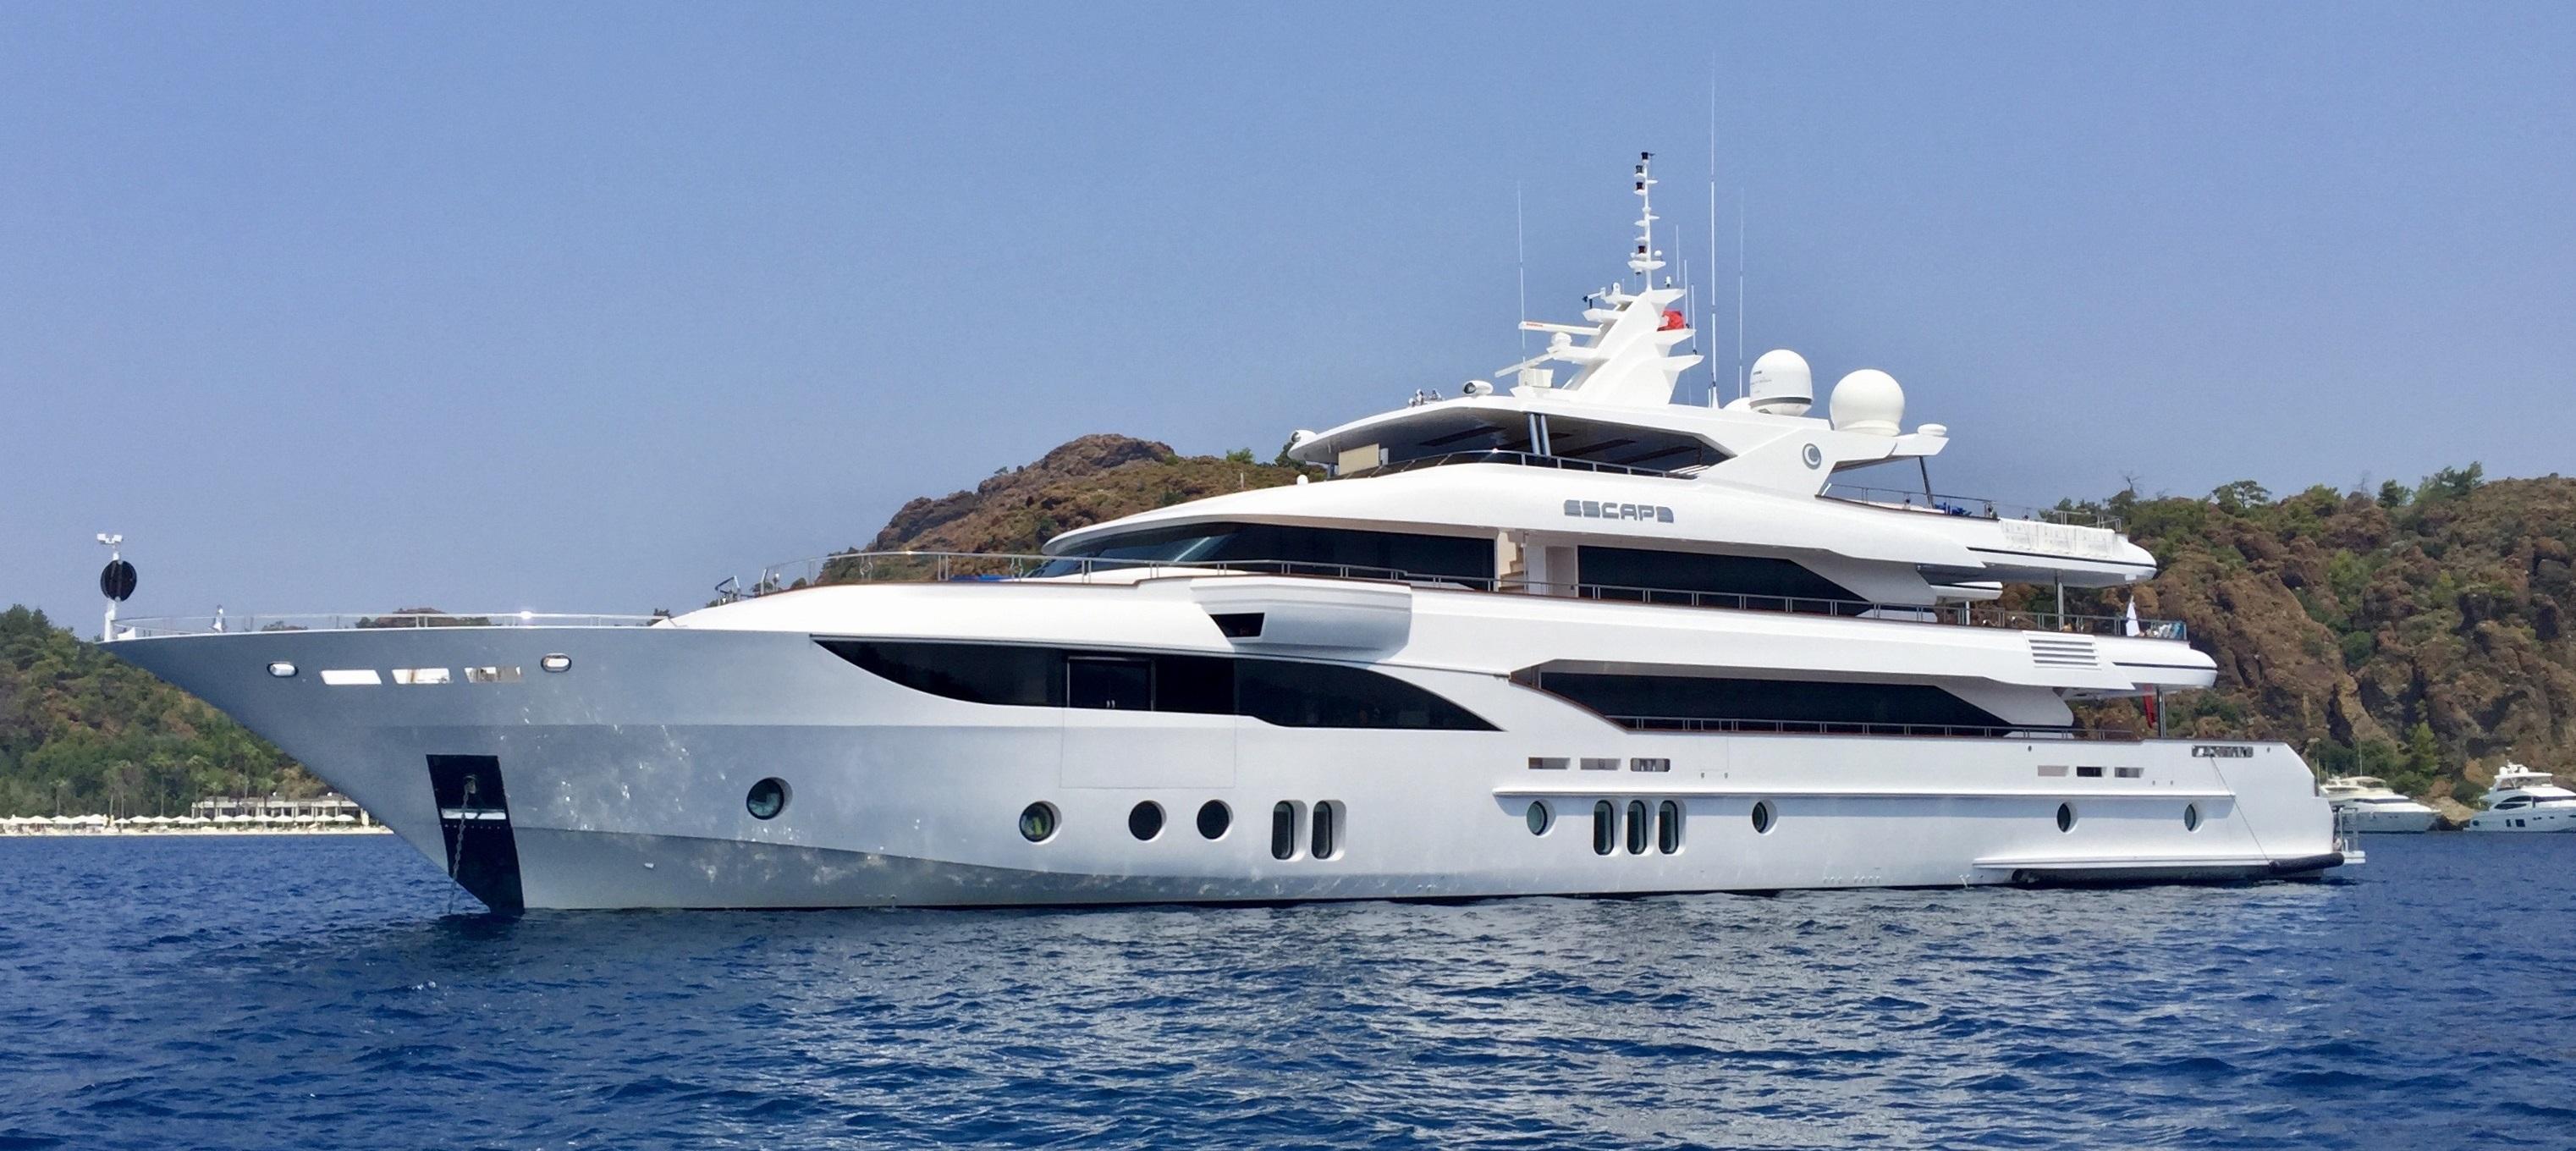 M/Y MY ESCAPE - YACHTZOO - Luxury Motor Yacht For Sale